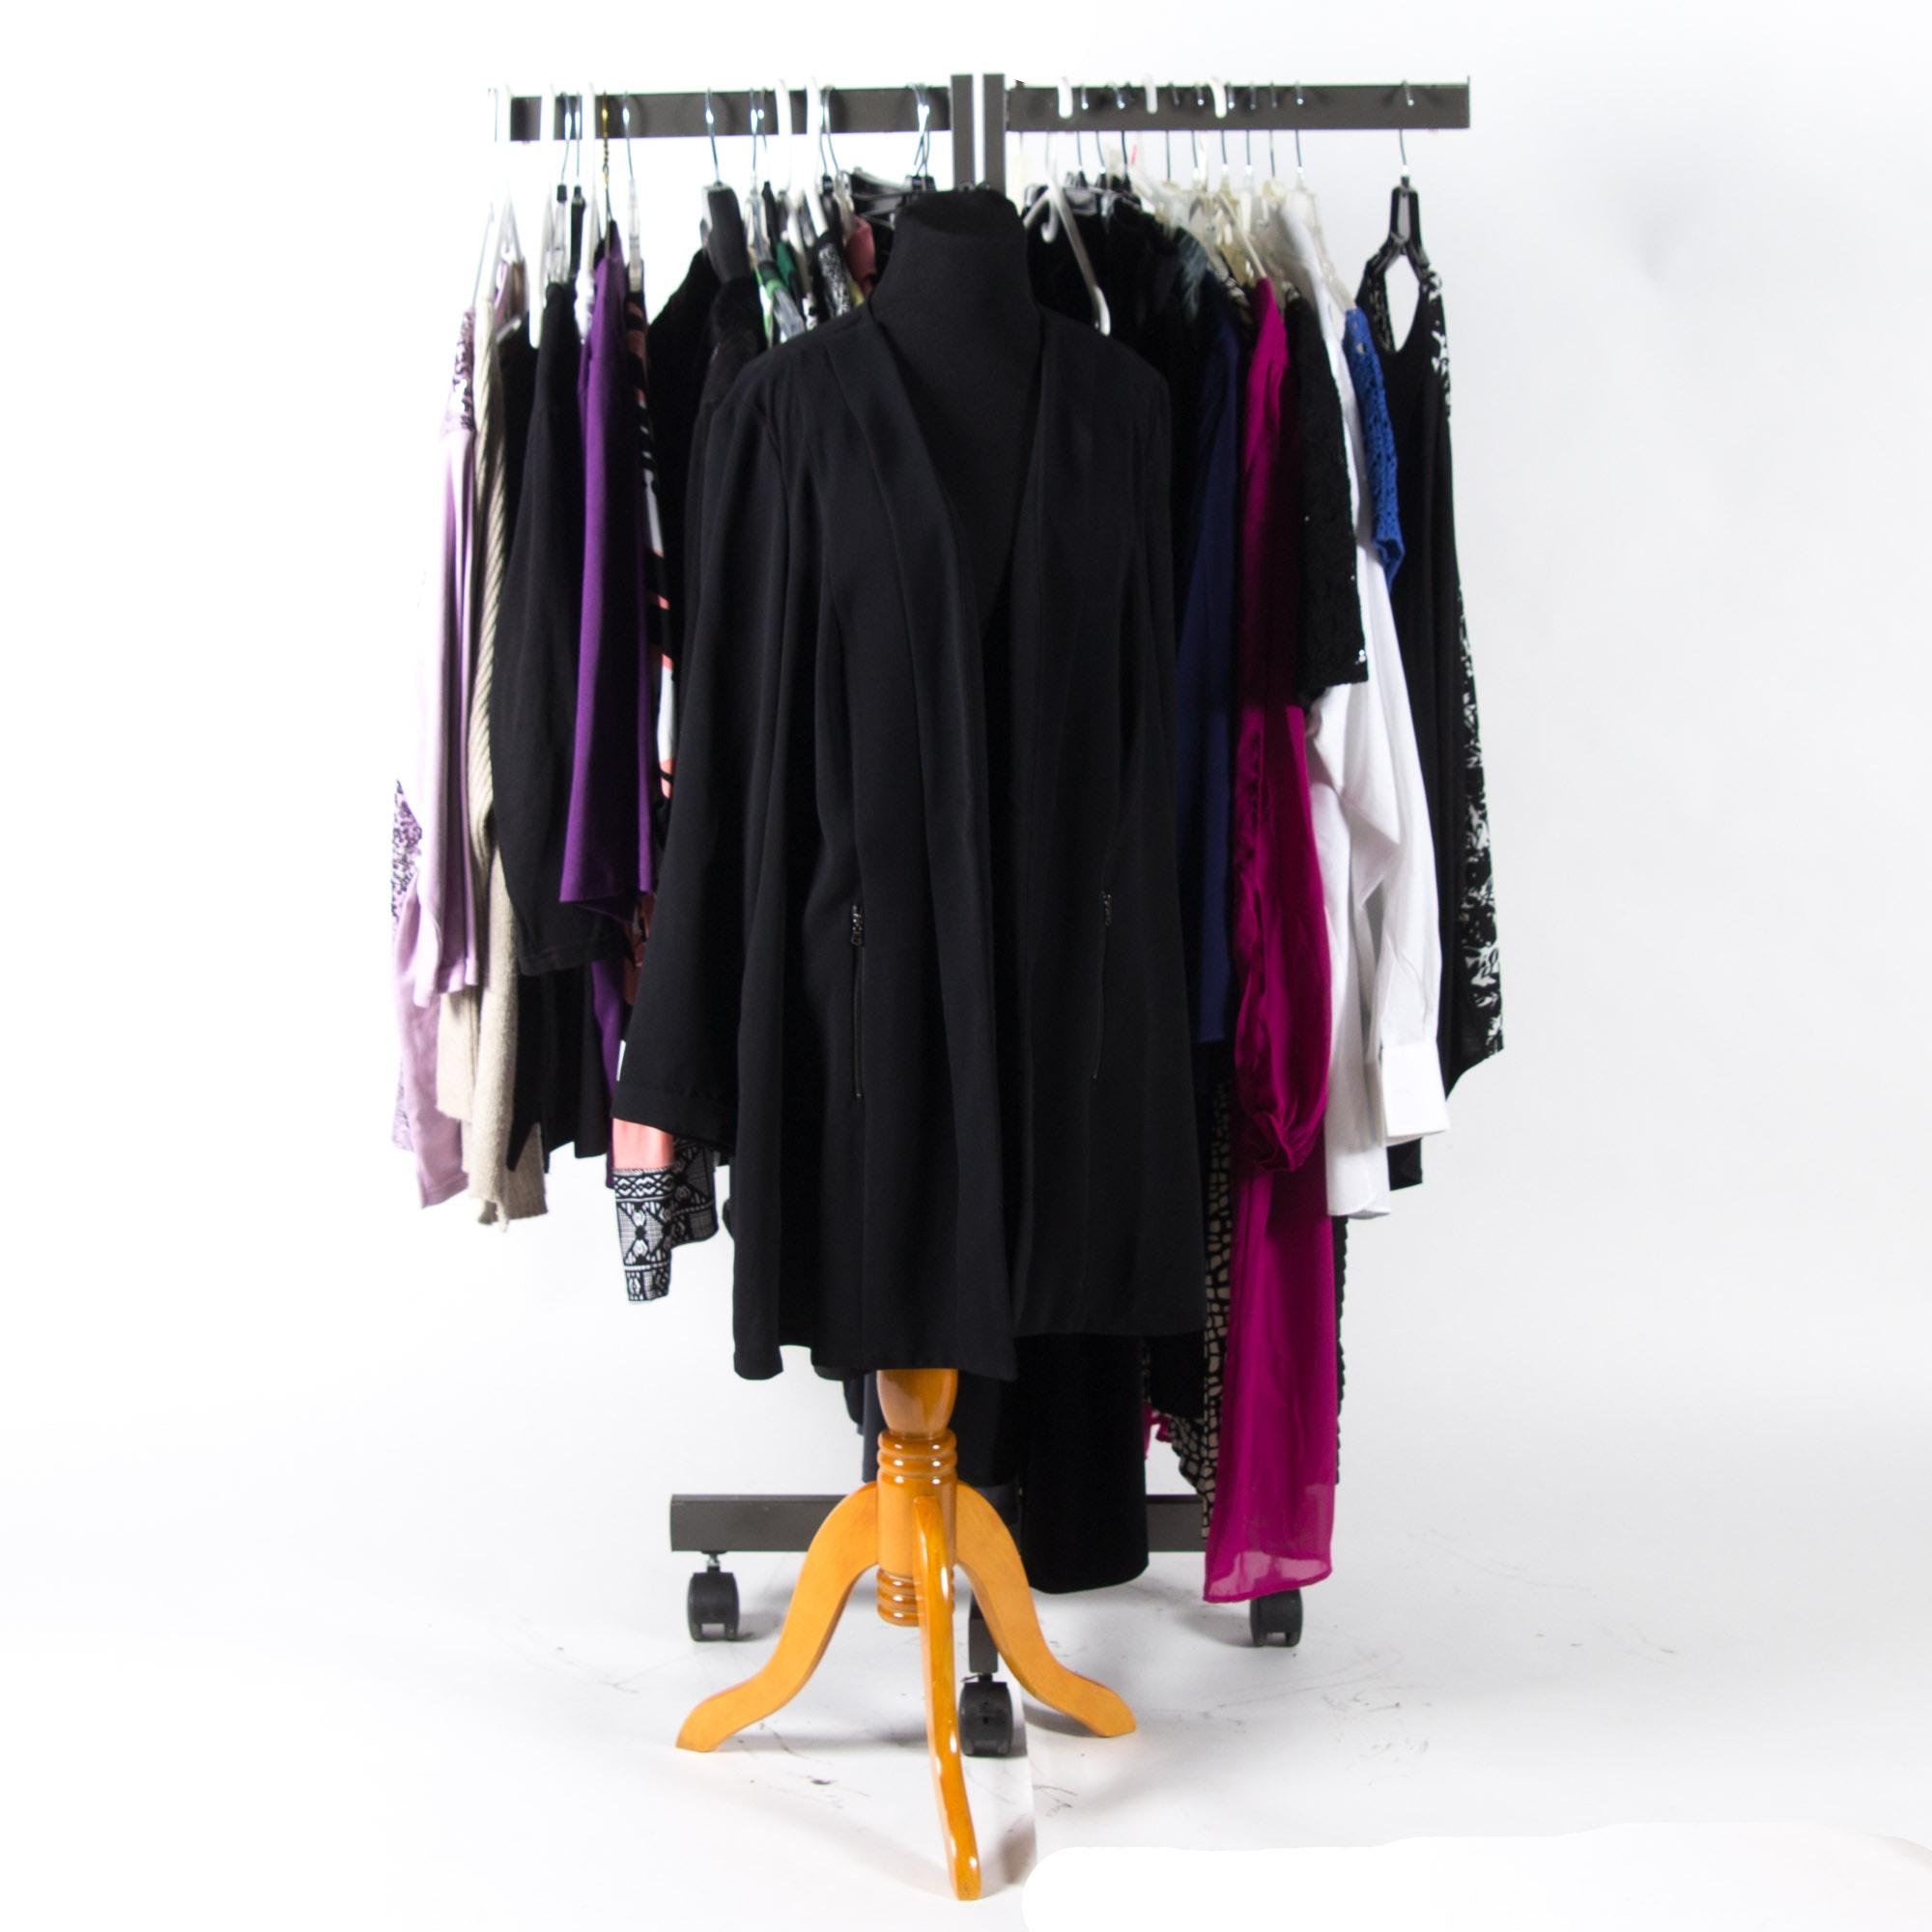 Assortment of Women's Clothing including Alfani and Vikki K